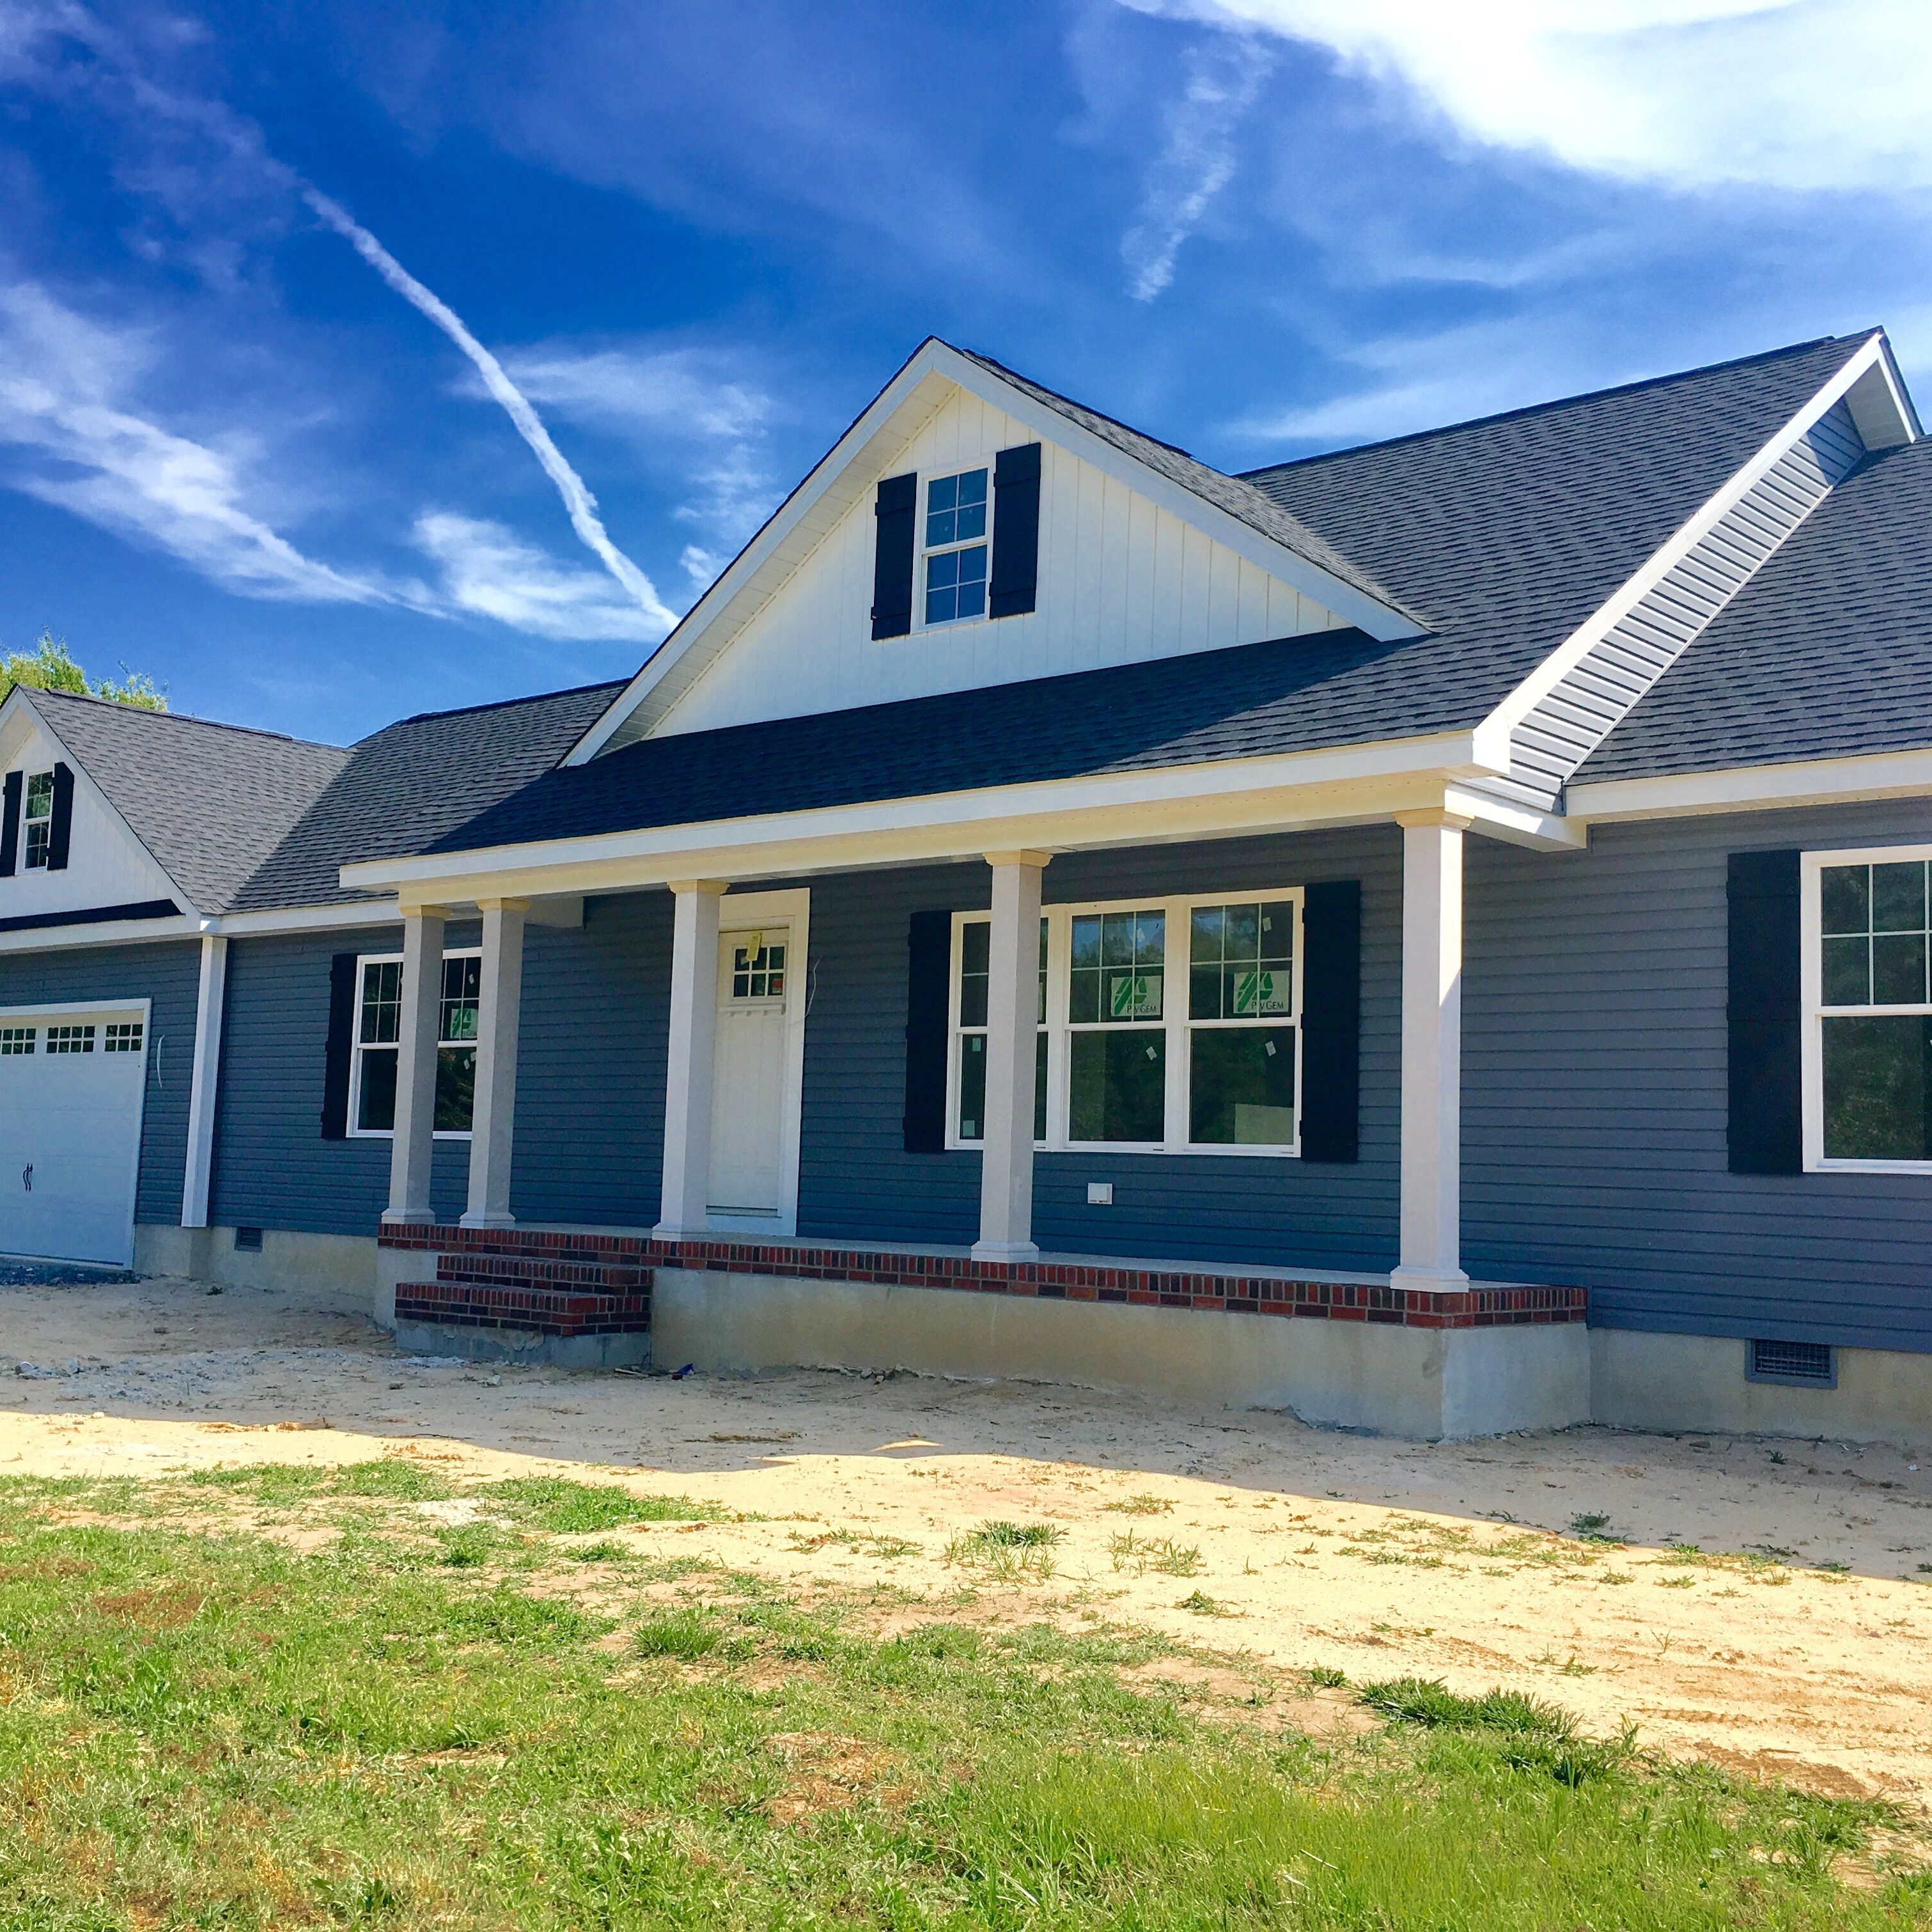 Delaware custom home plans designs hunter creek homes for Our home designs